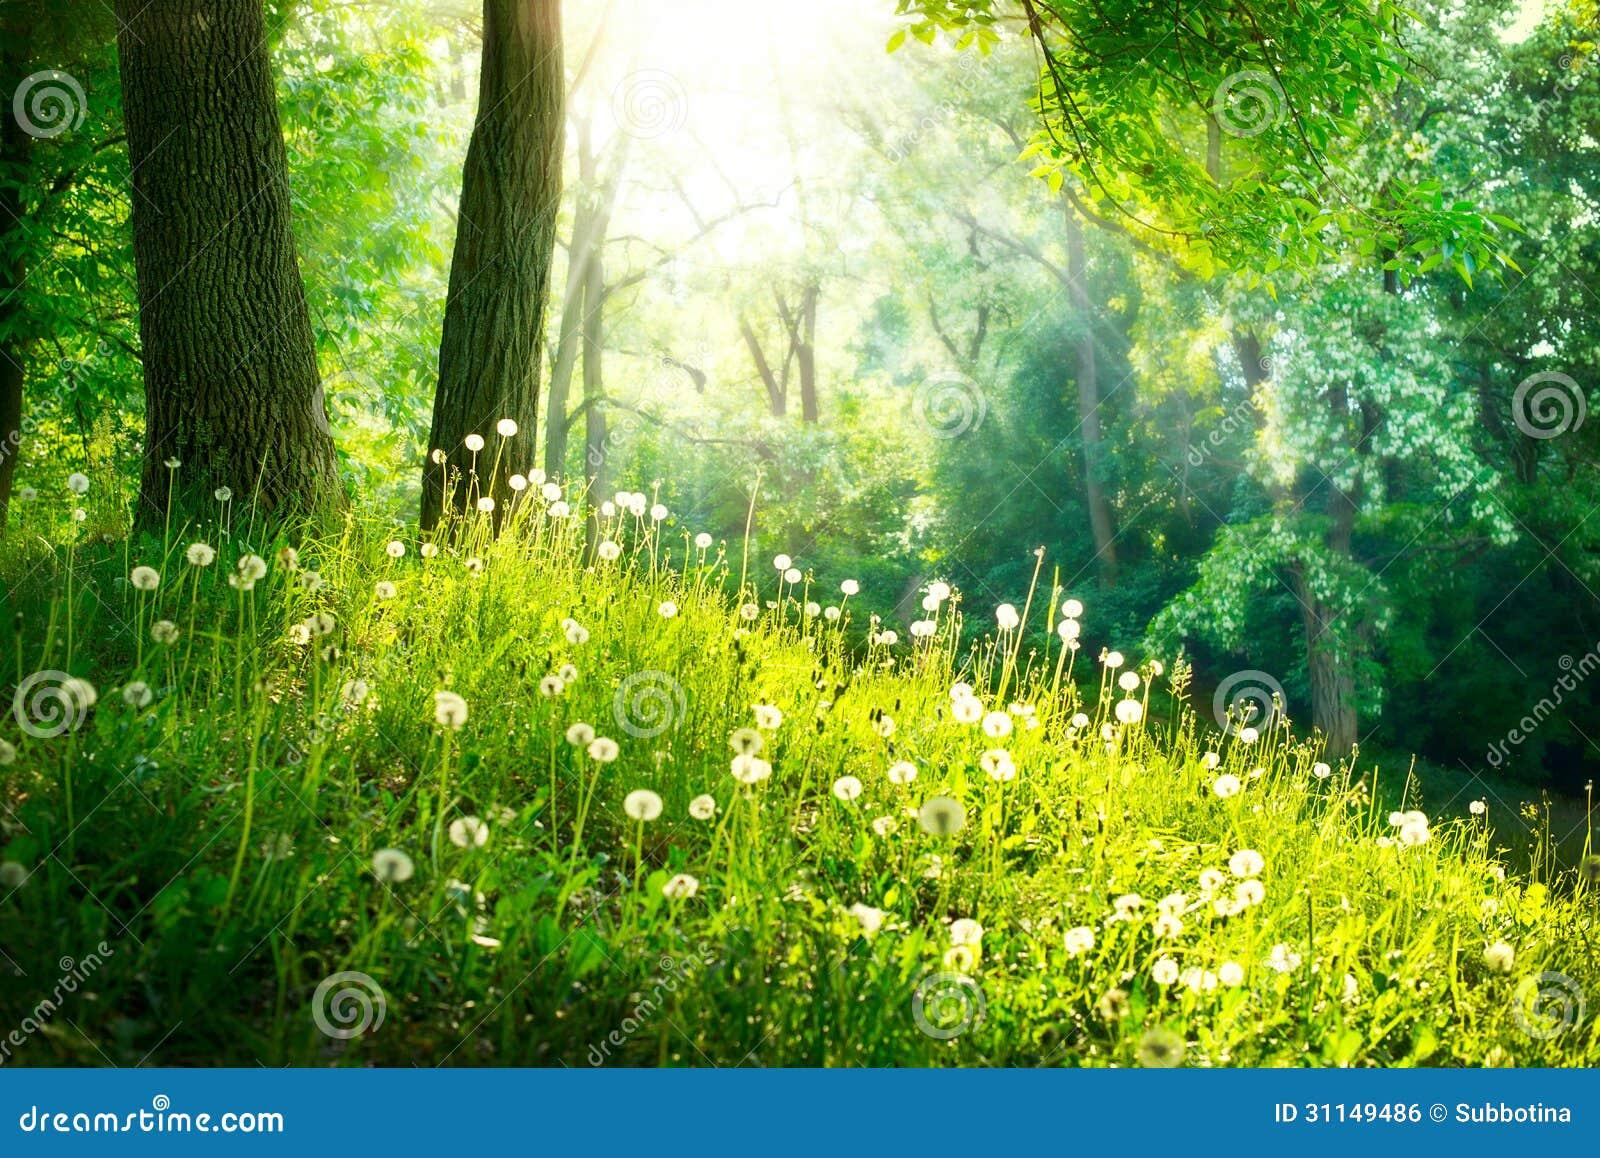 风景。绿草和树